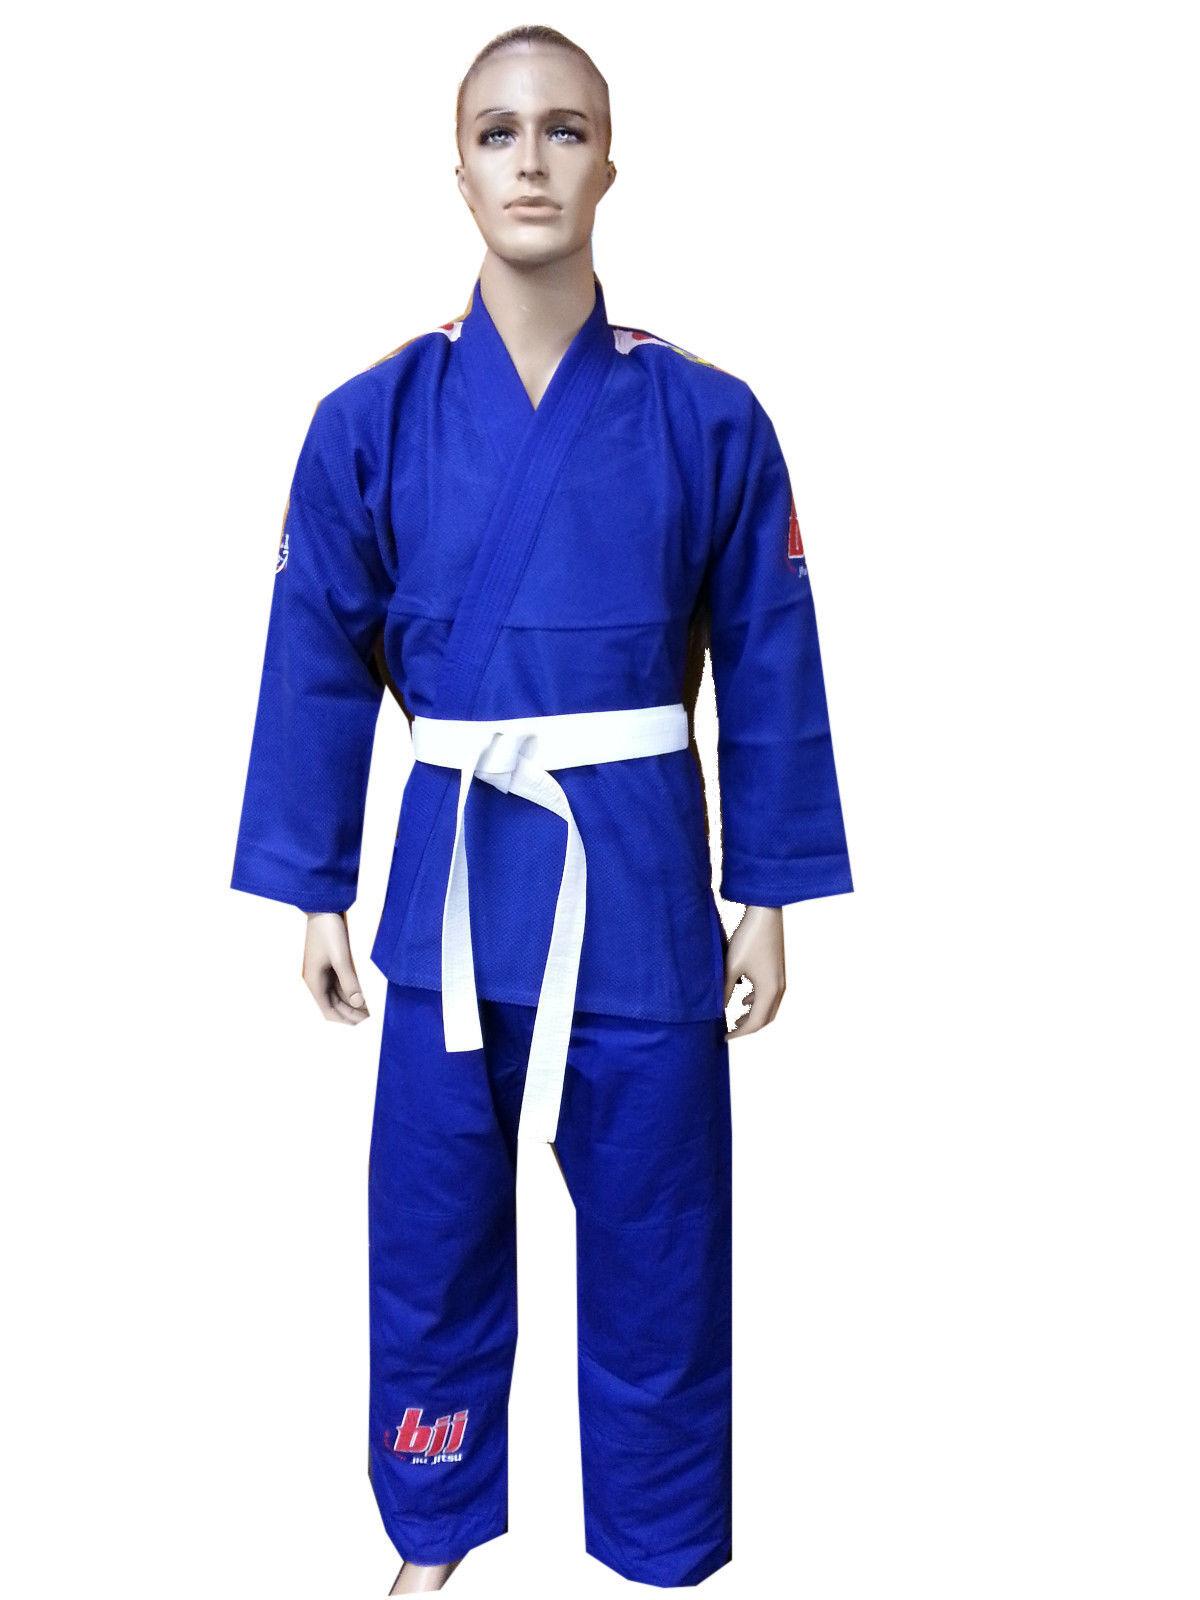 Woldorf usa BJJ jiu jitsu  uniform gi student in bluee color single weave  official authorization